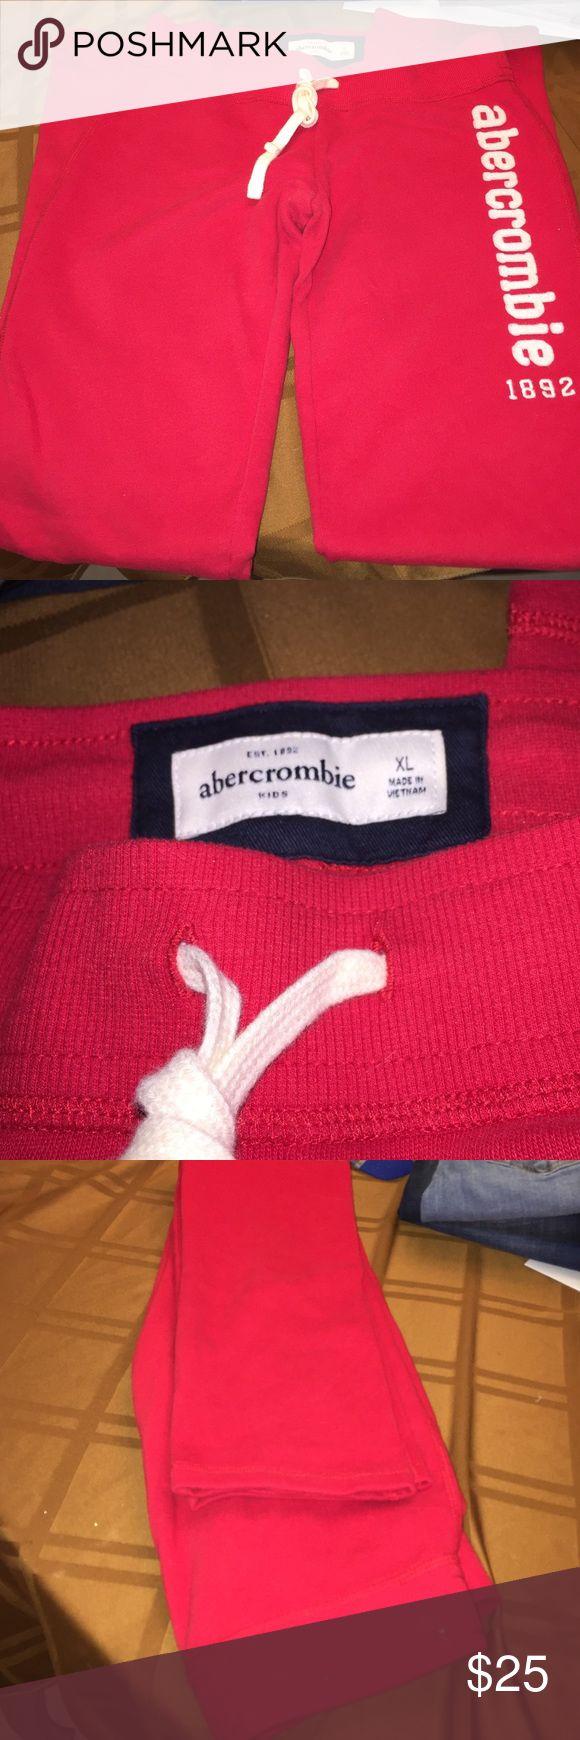 Abercrombie kids girl sweatpants Brand new Abercrombie kids girls sweatpants size XL abercrombie kids Bottoms Sweatpants & Joggers